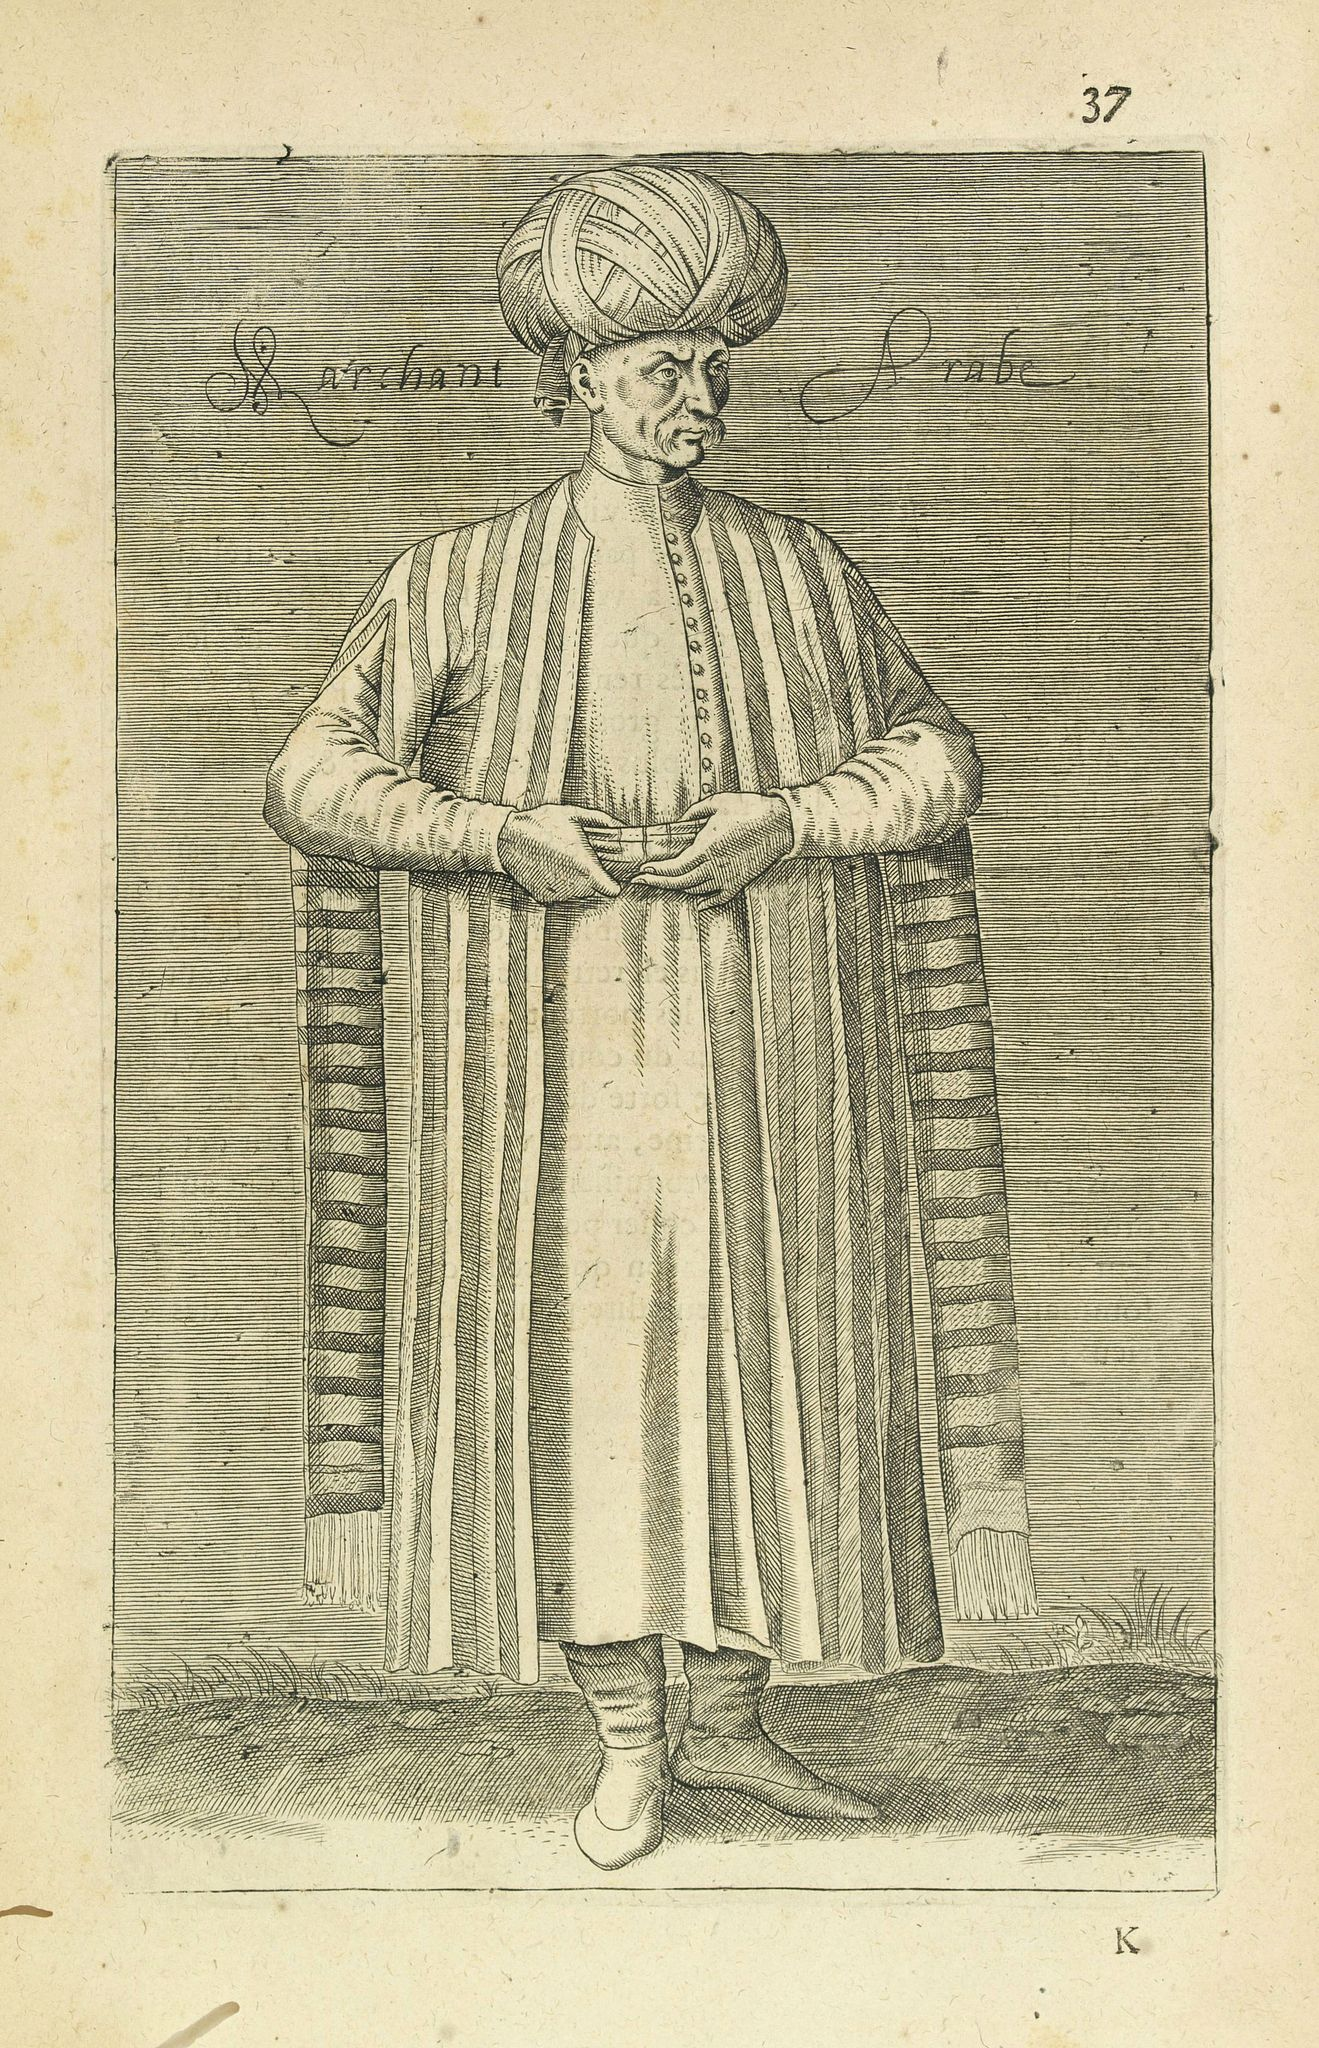 NICOLAS DE NICOLAY, Thomas Artus (sieur d'Embry). -  Marchant Arabe. (37)